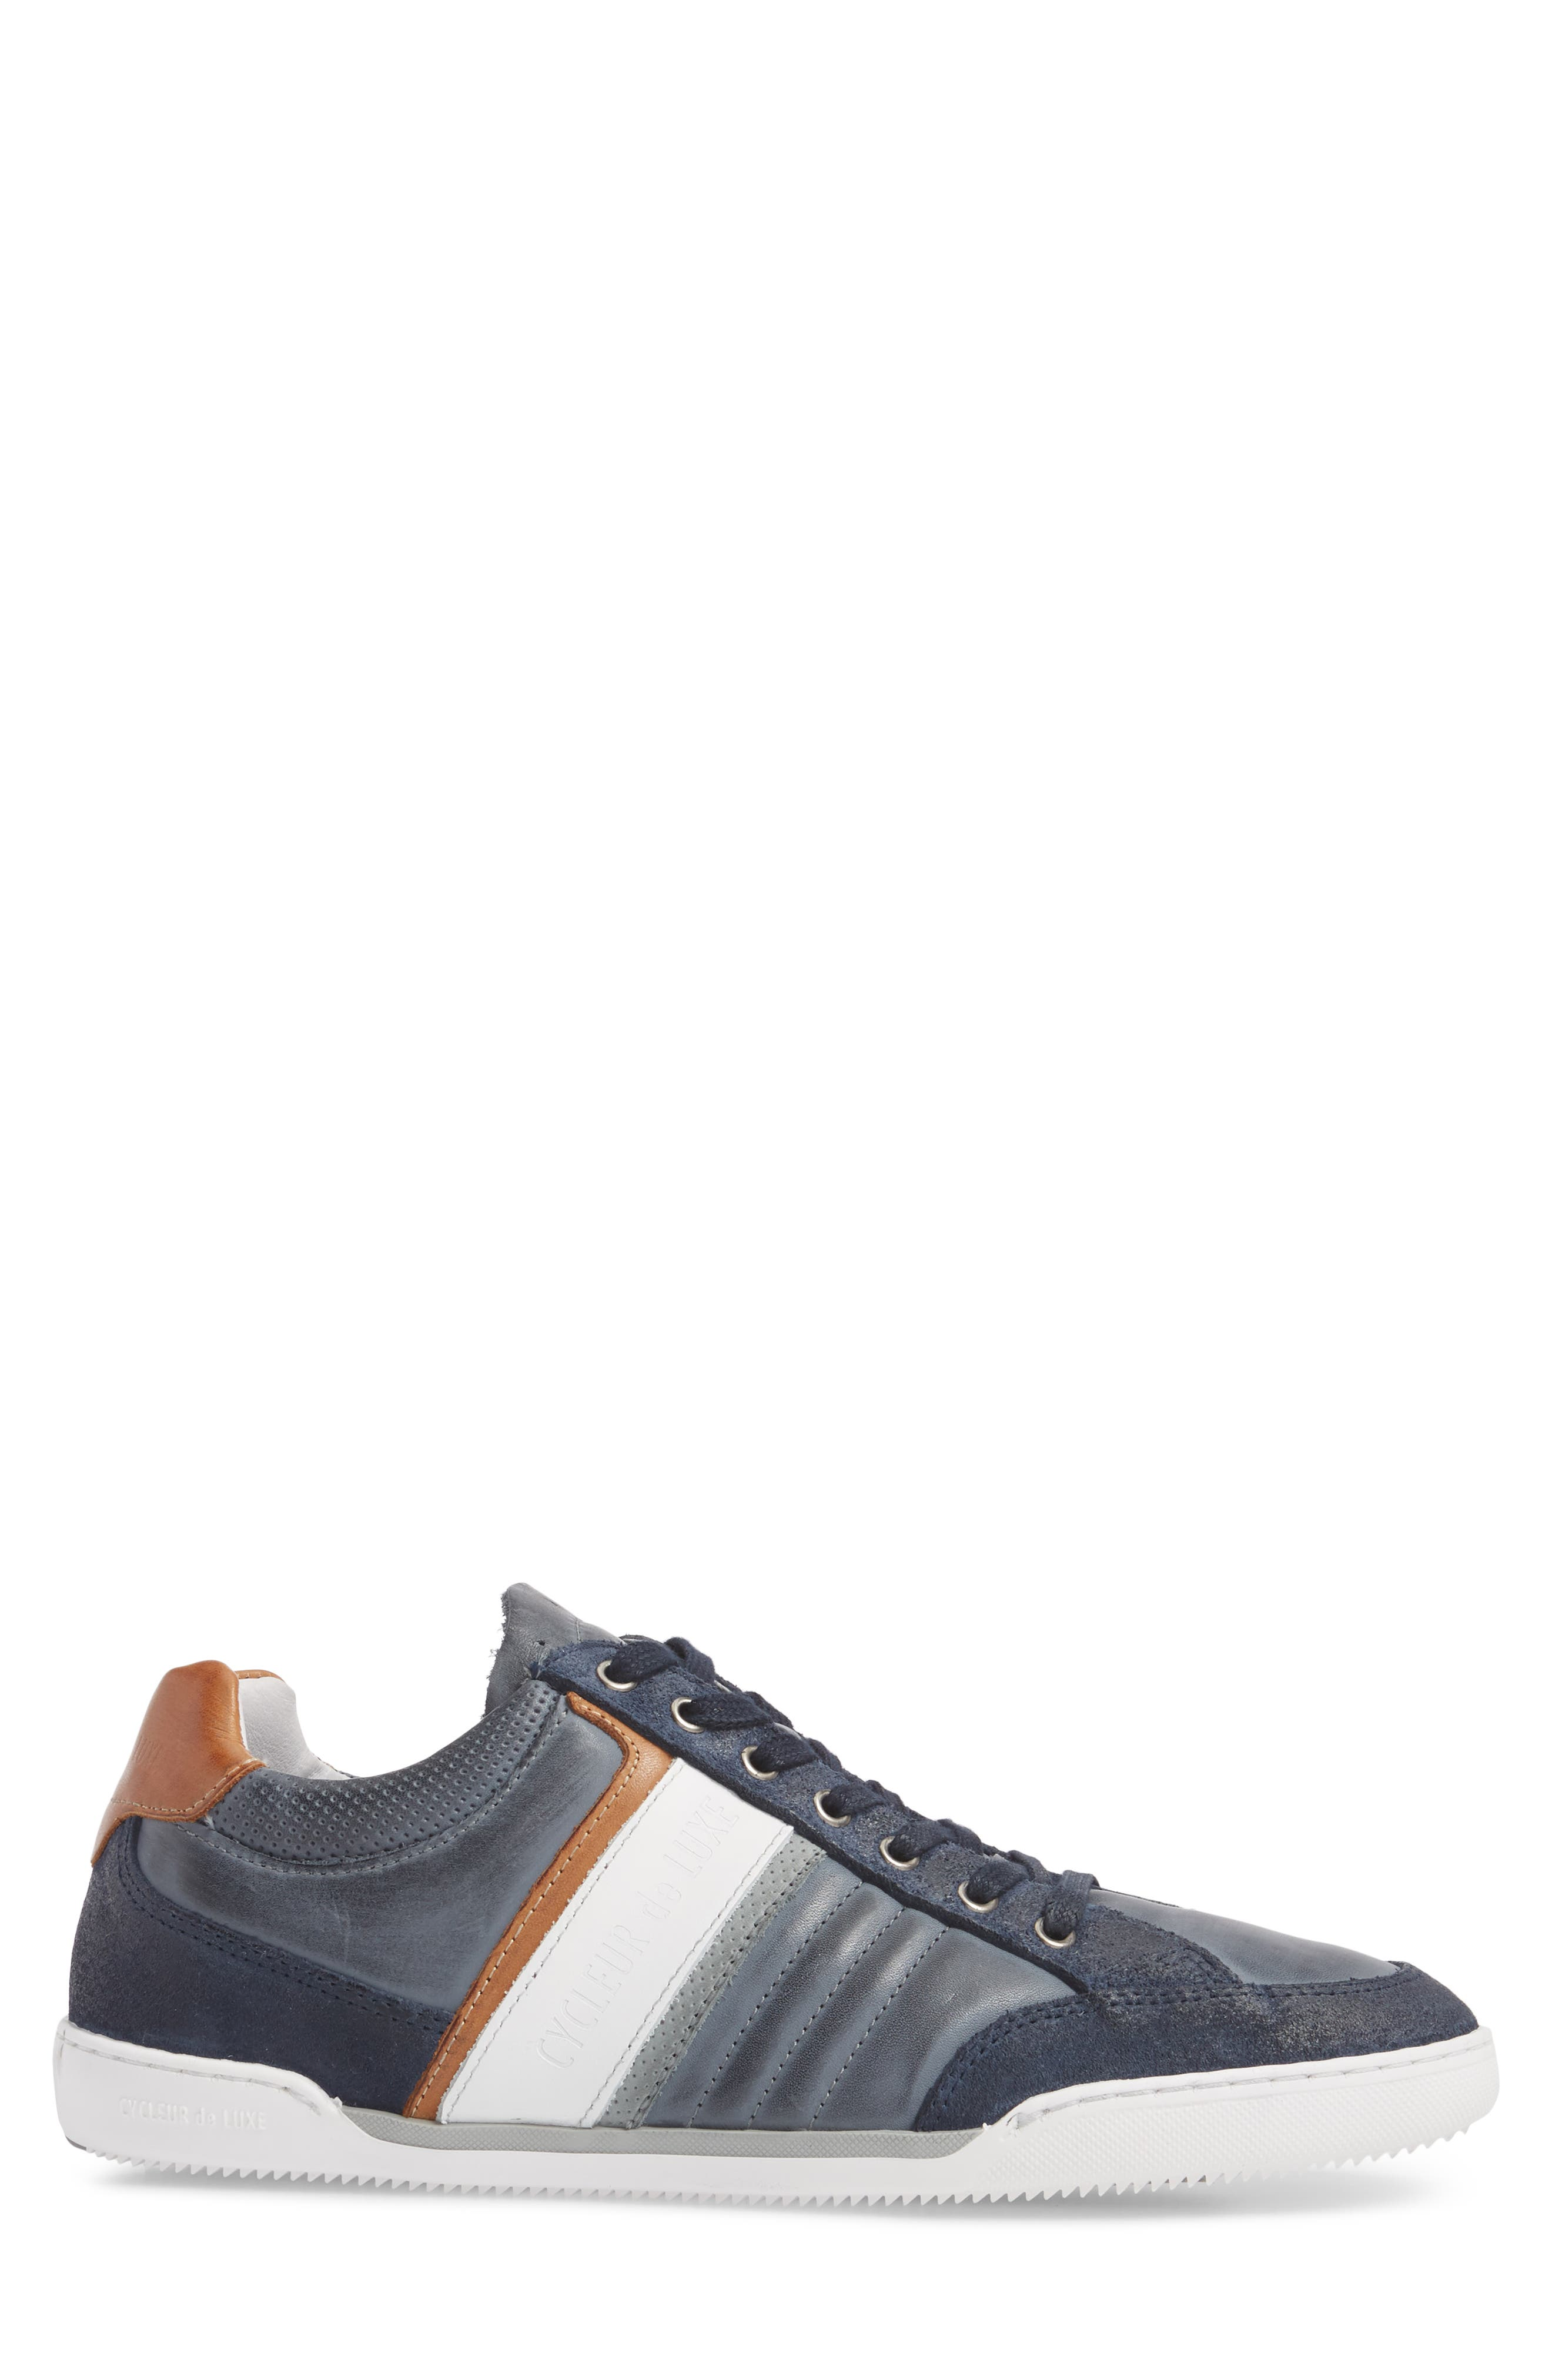 Solo Low Top Sneaker,                             Alternate thumbnail 3, color,                             Denim/ White/ Cognac Leather